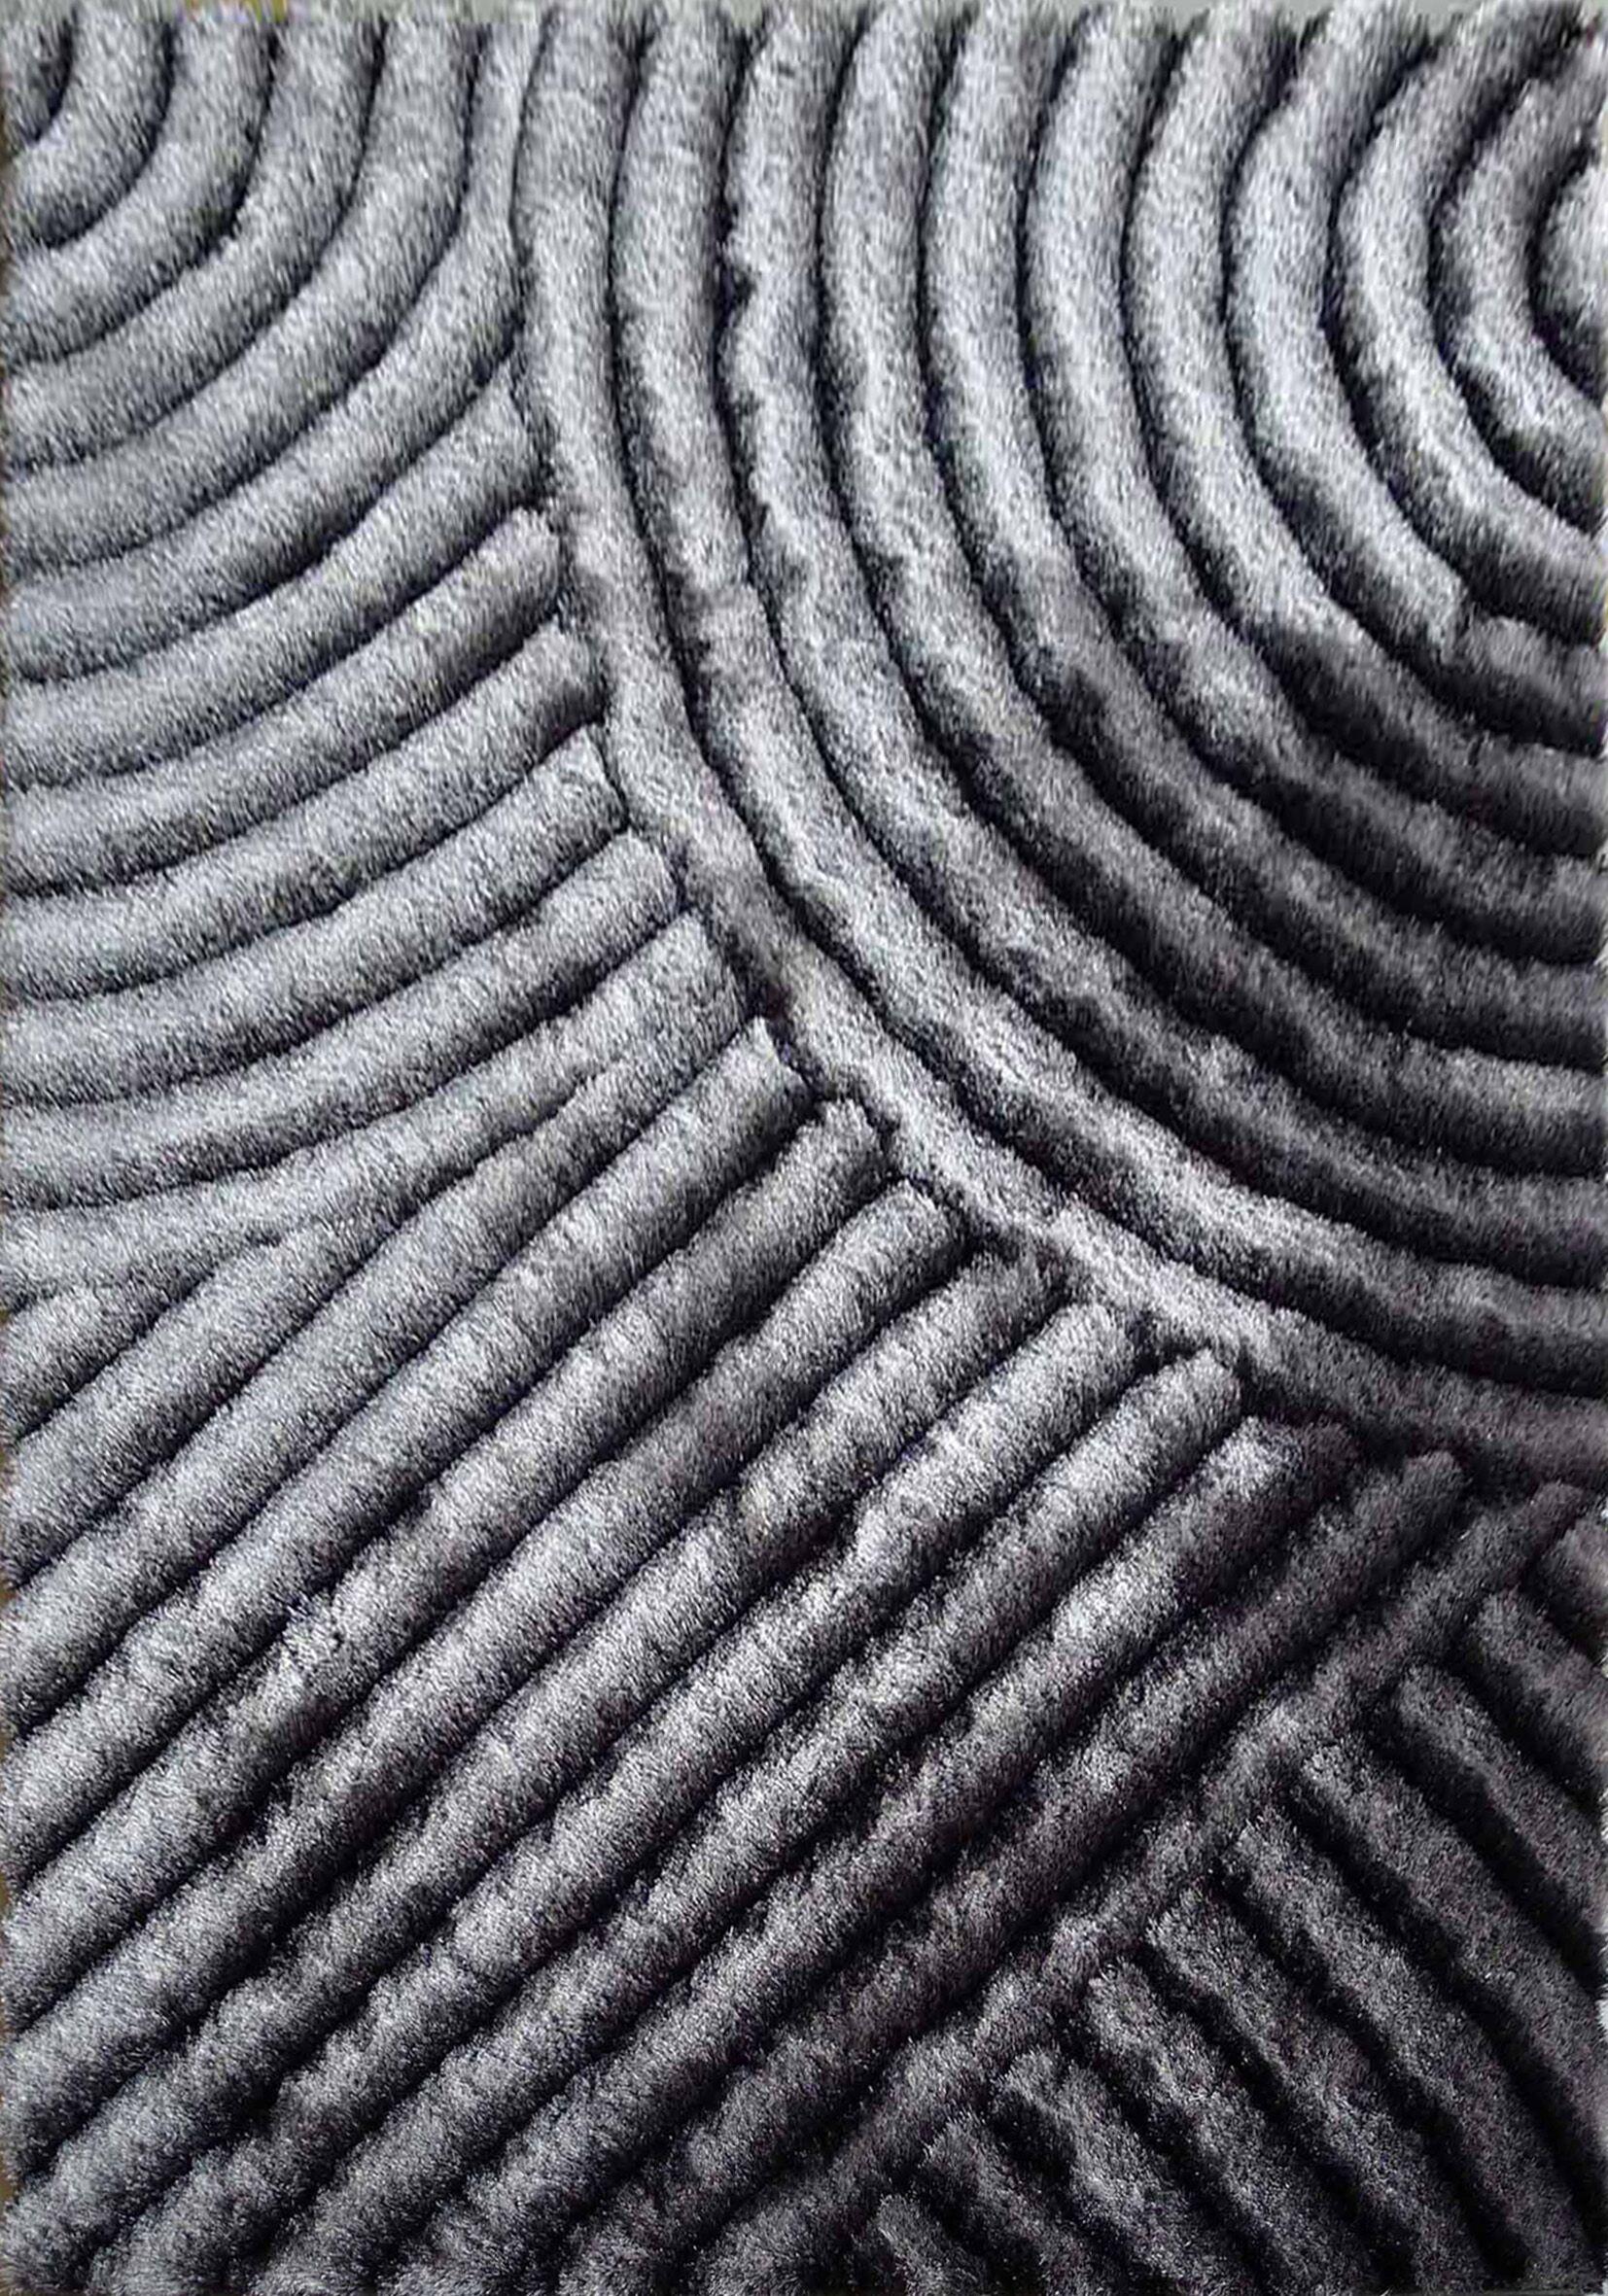 Mcfarren Design Hand-Woven Gray Area Rug